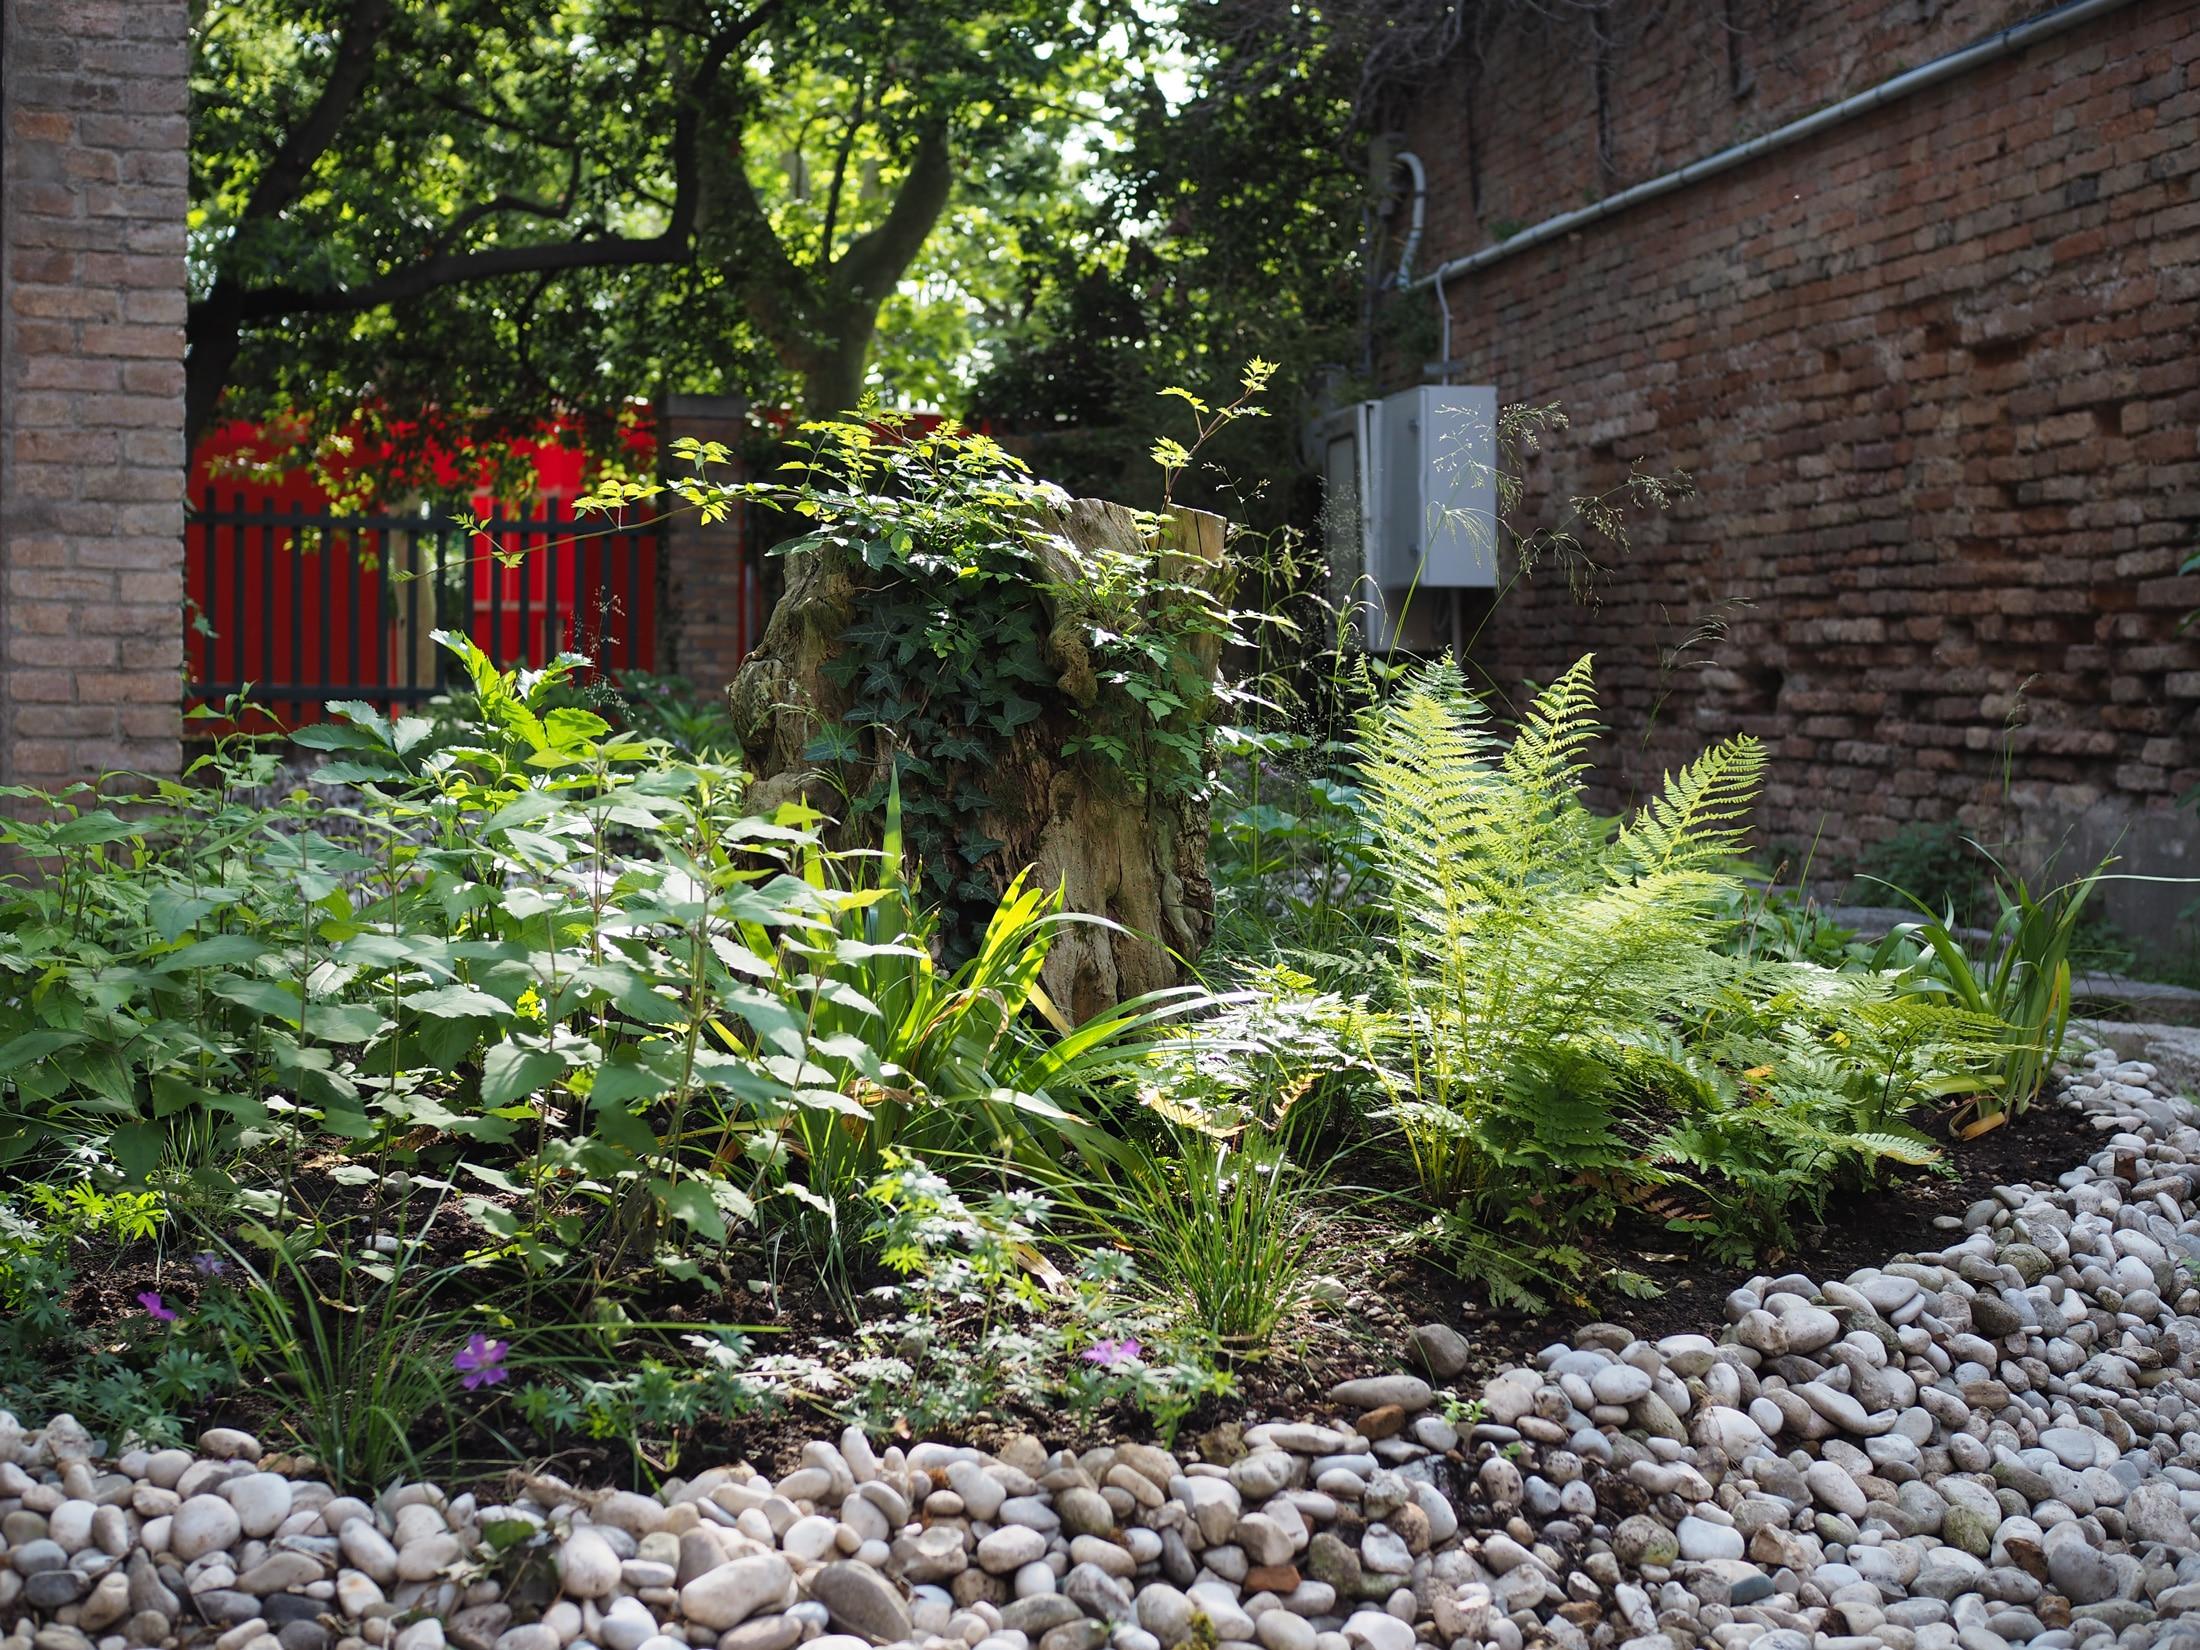 Jardin (in)temporal – Detalle